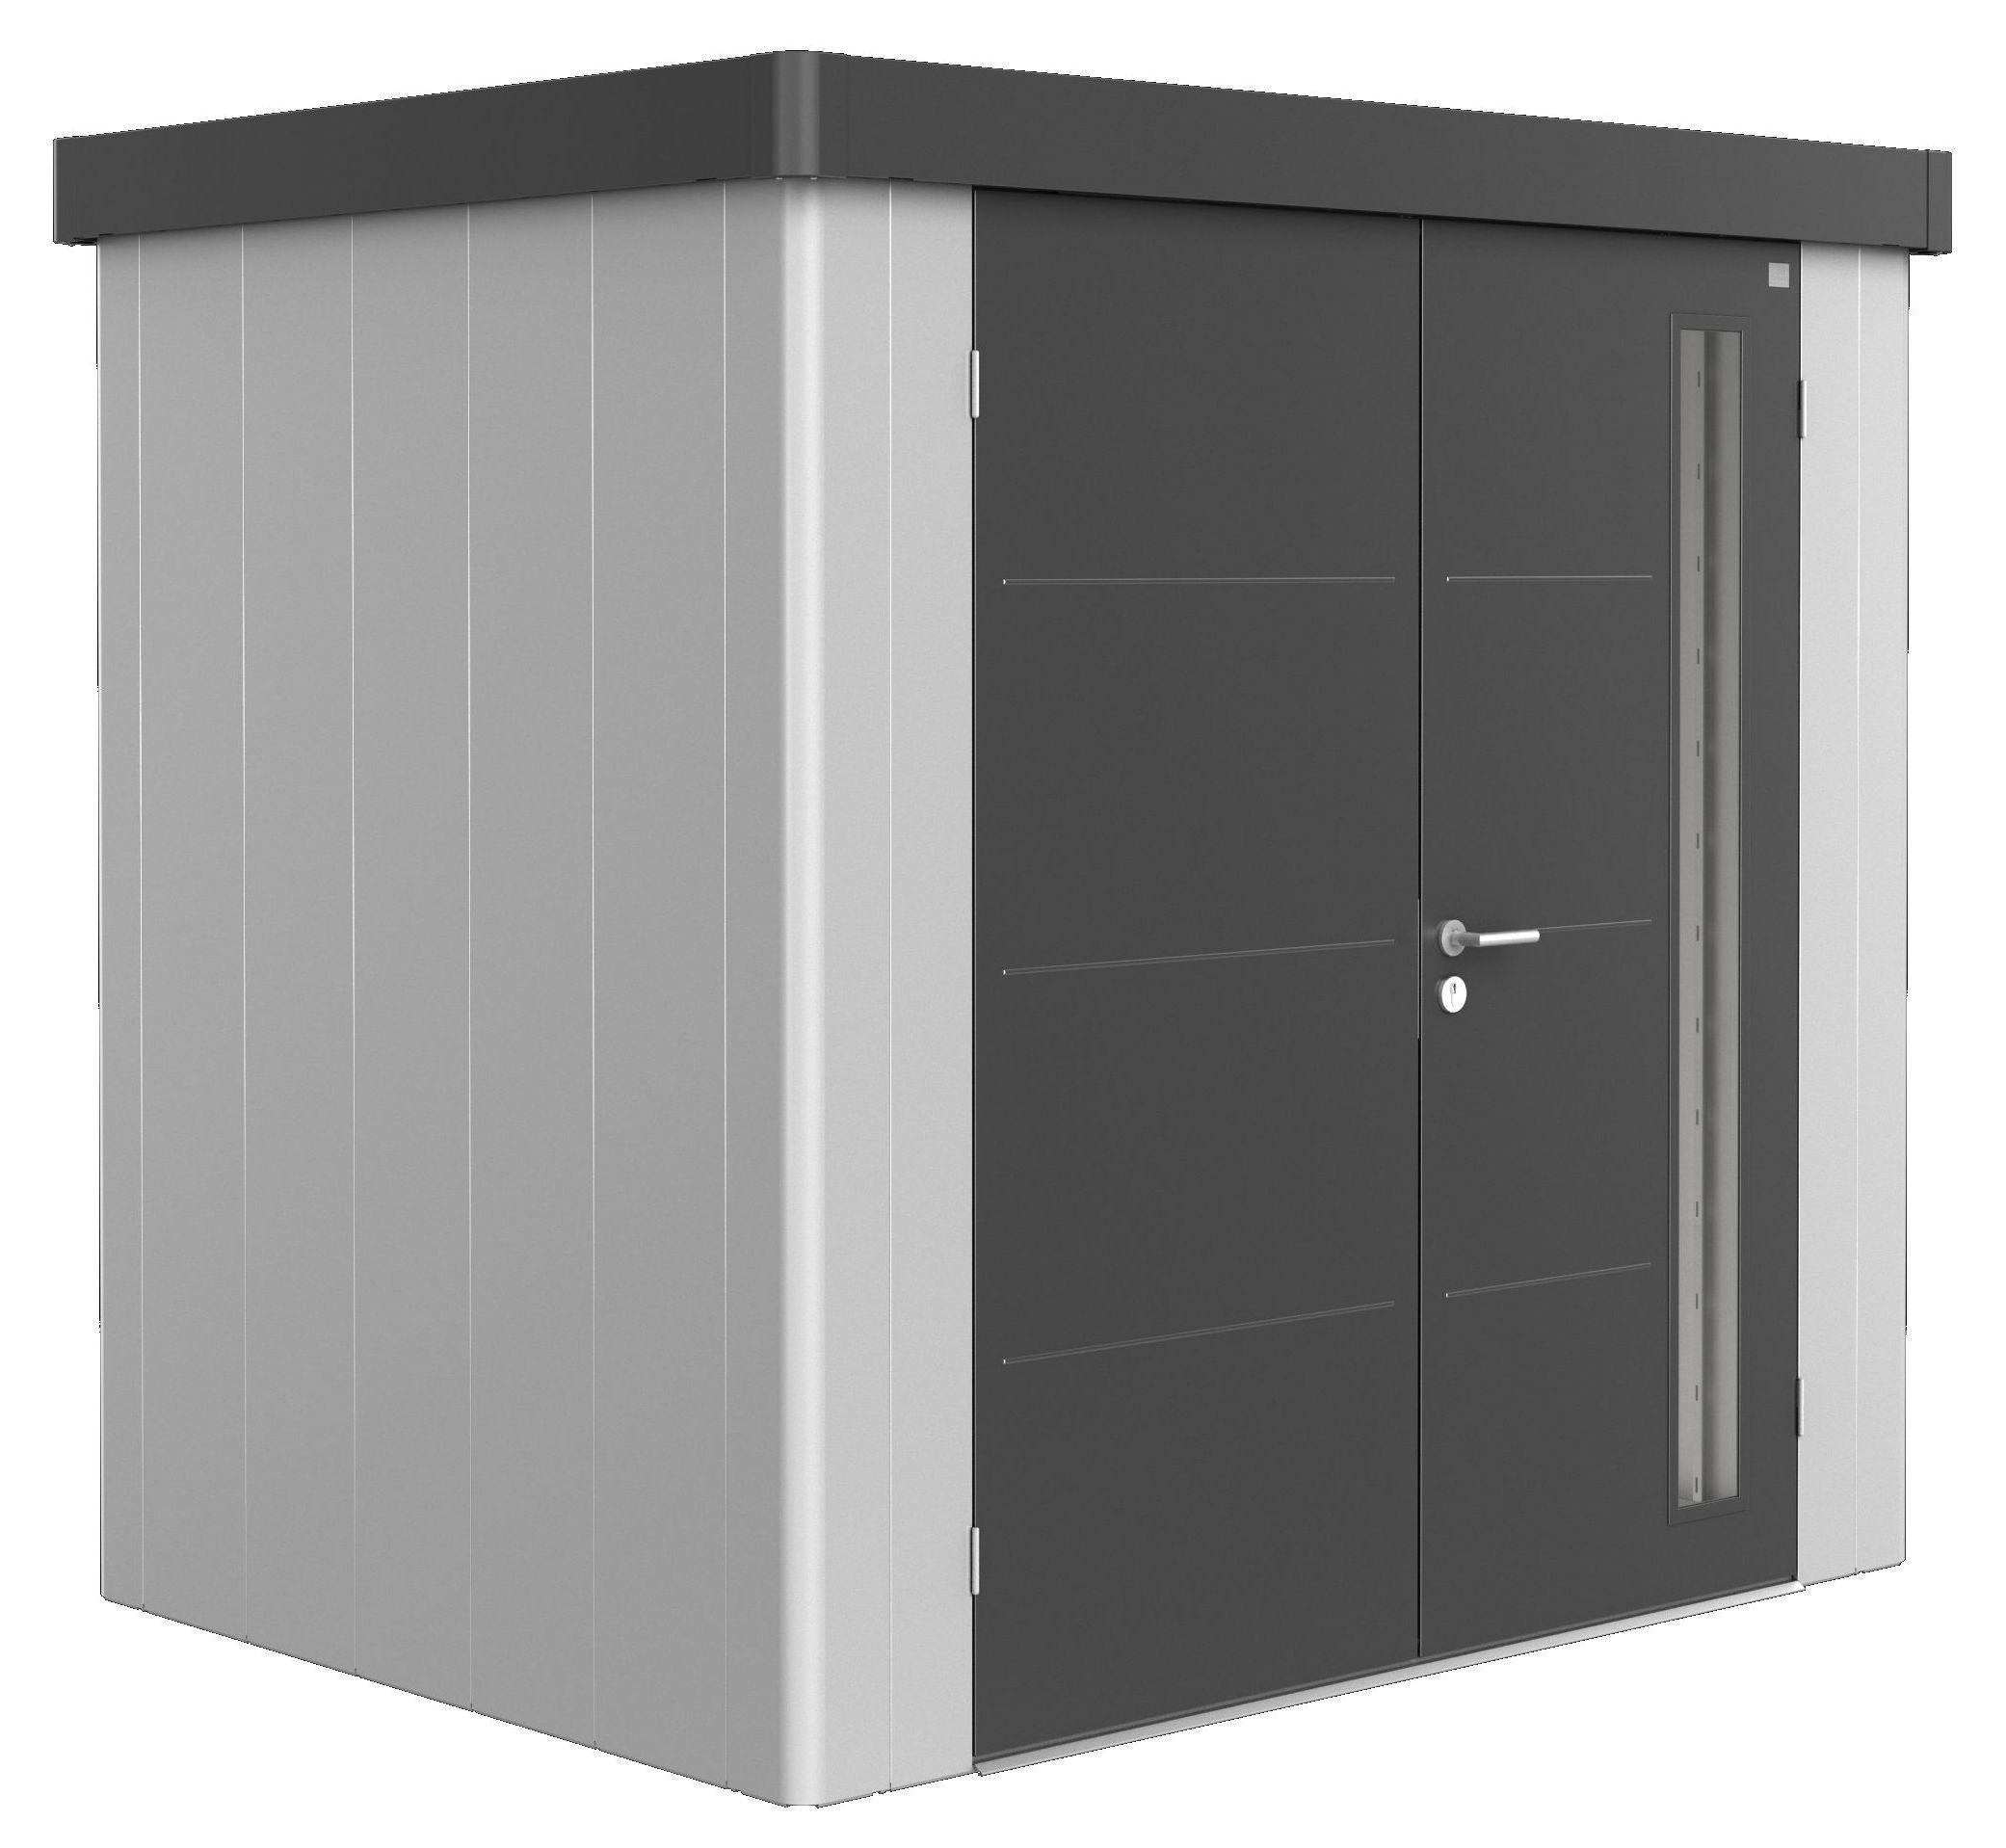 Biohort Zahradní domek NEO 1B, varianta 1.3 stříbrná metalíza